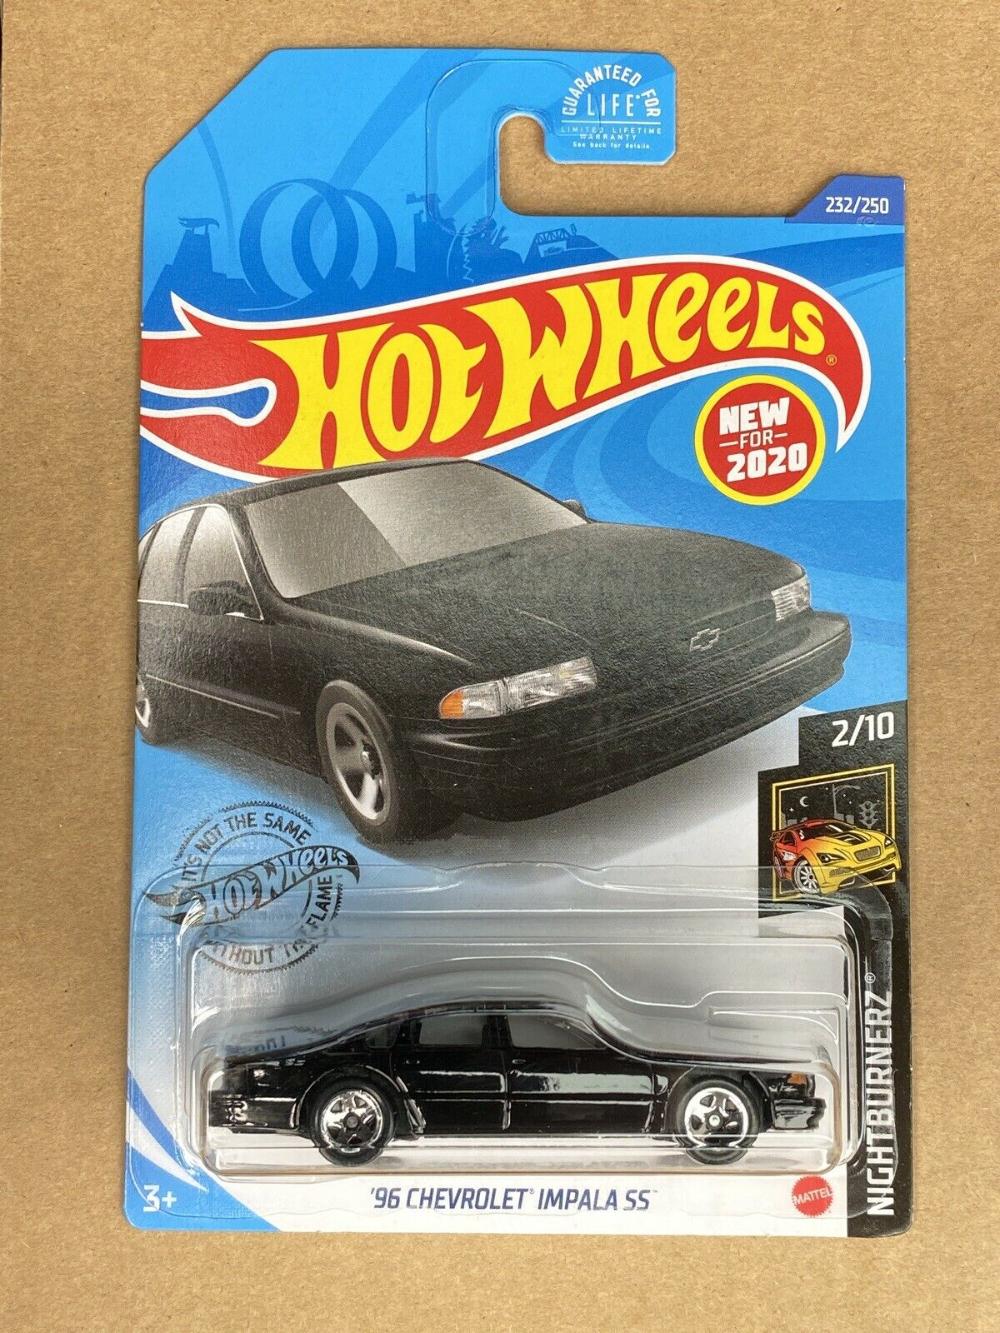 2020 hot wheels n case 96 Chevrolet Impala SS